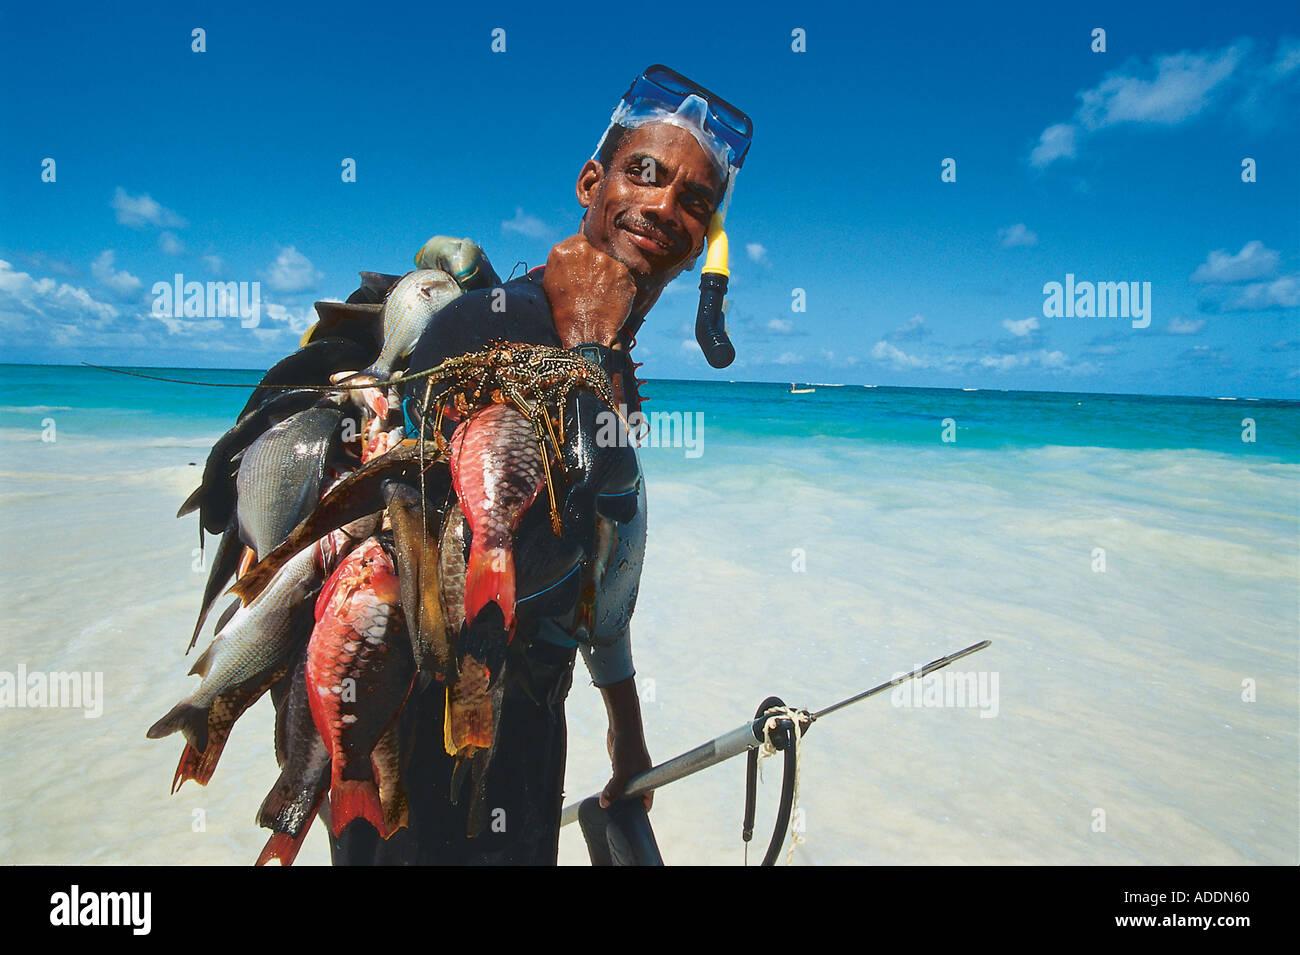 Fischer, Sam Lord's Beach, St. Philip, Barbados Karibik - Stock Image